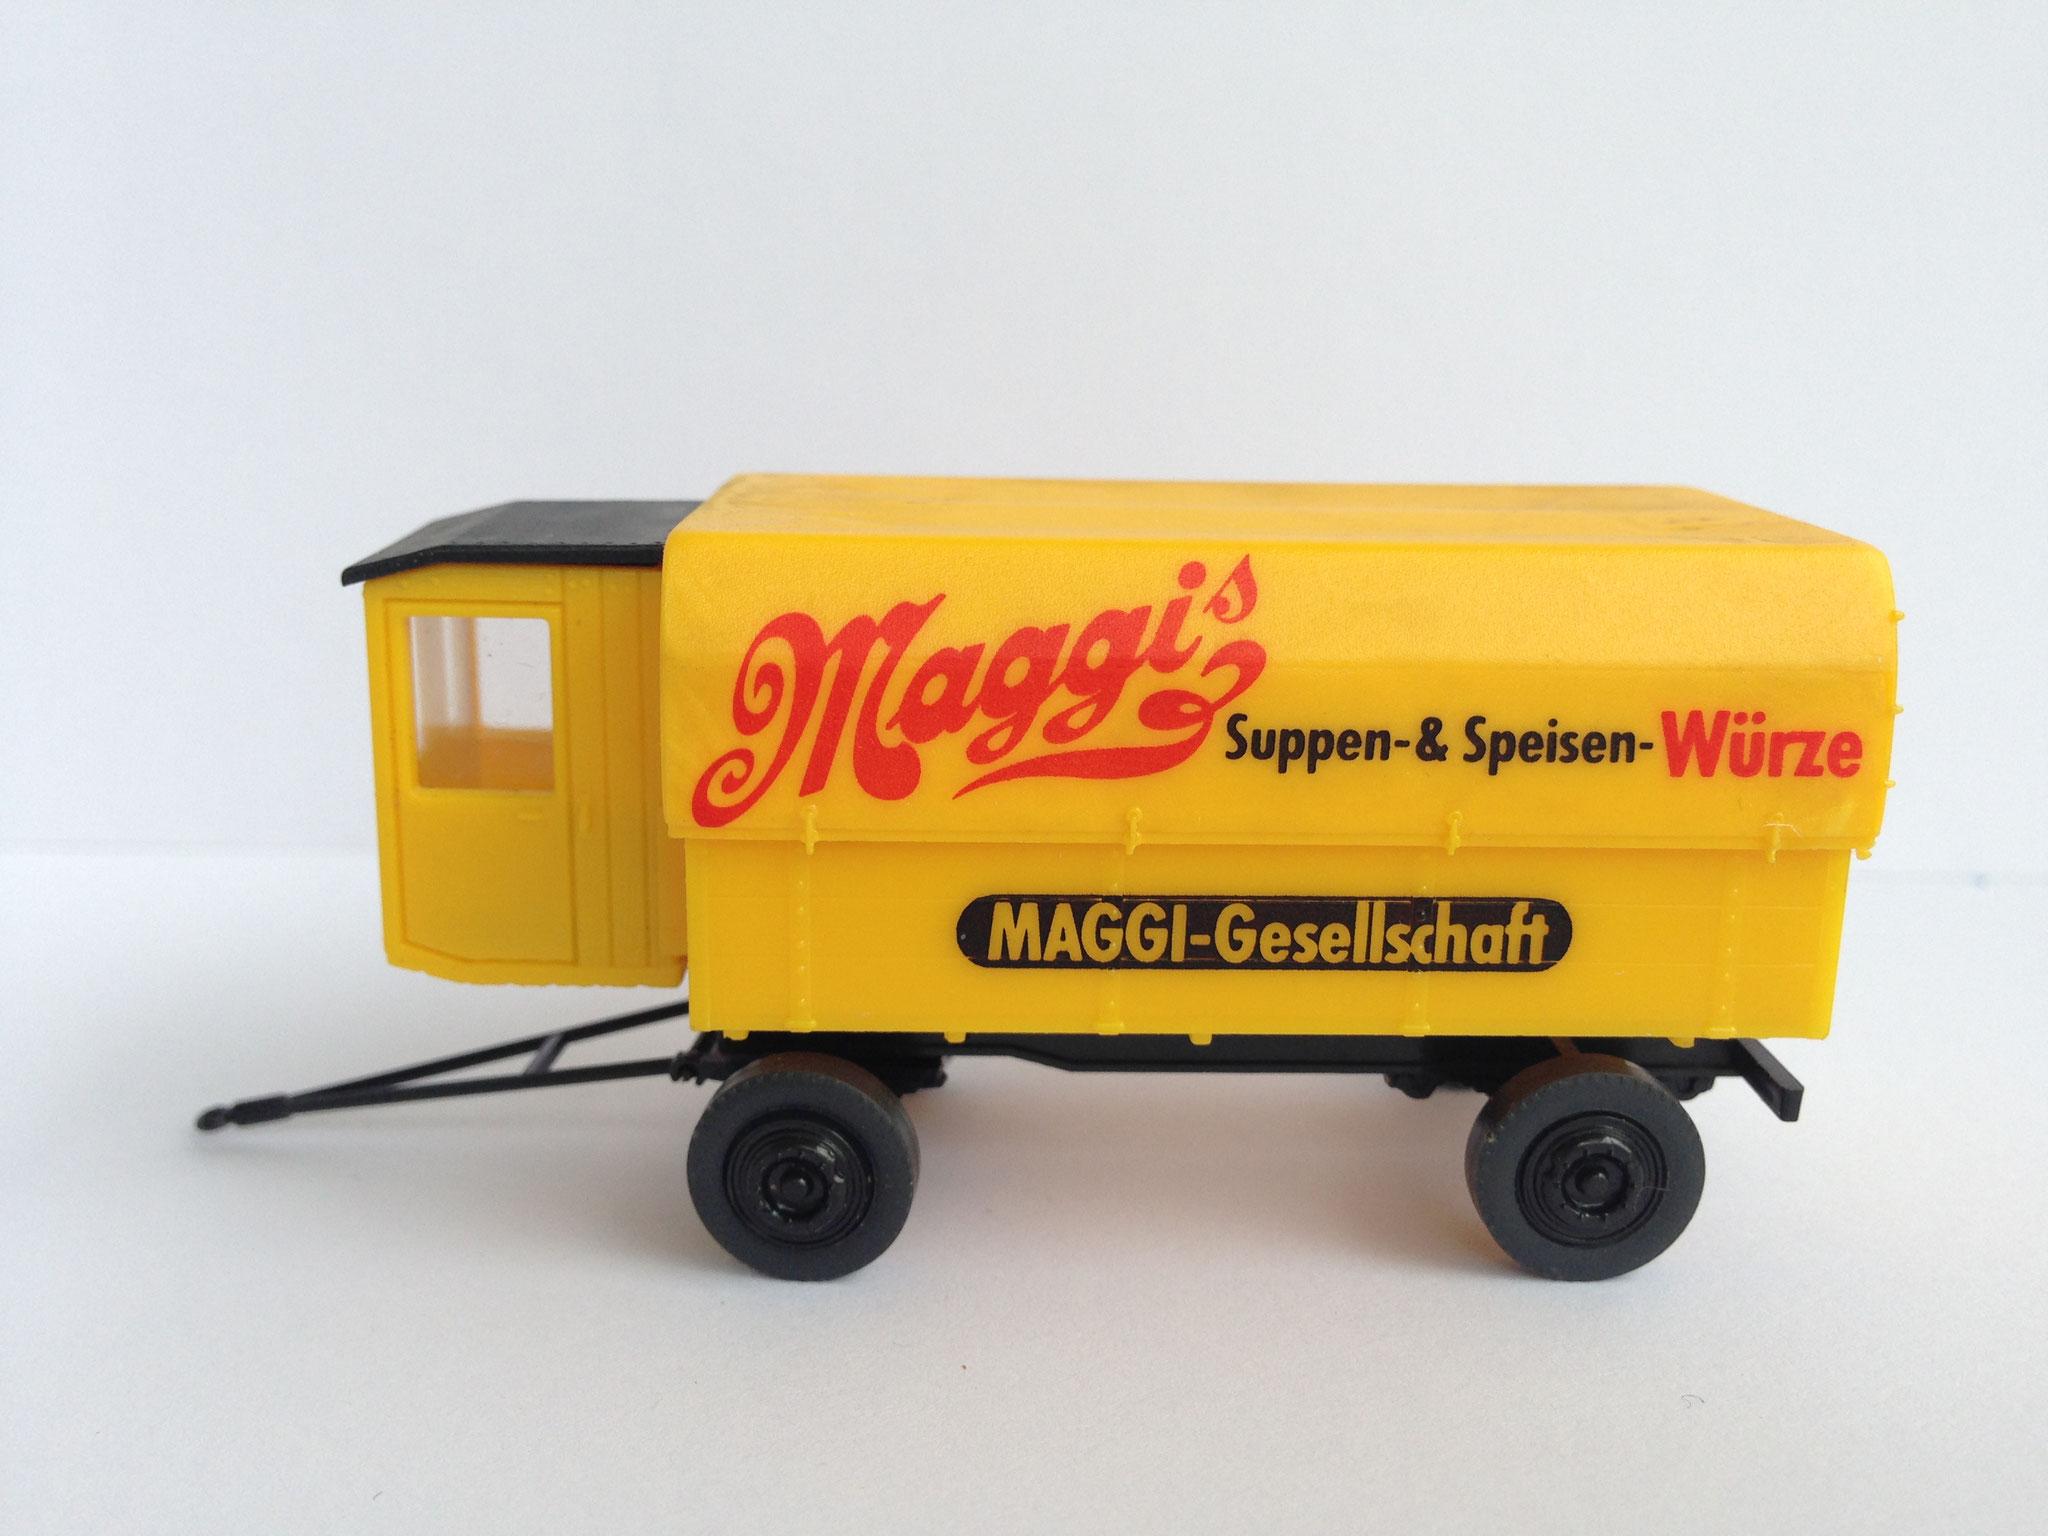 Anhänger Maggi, Art. Nr. 1051 (ab 1990 im Programm)